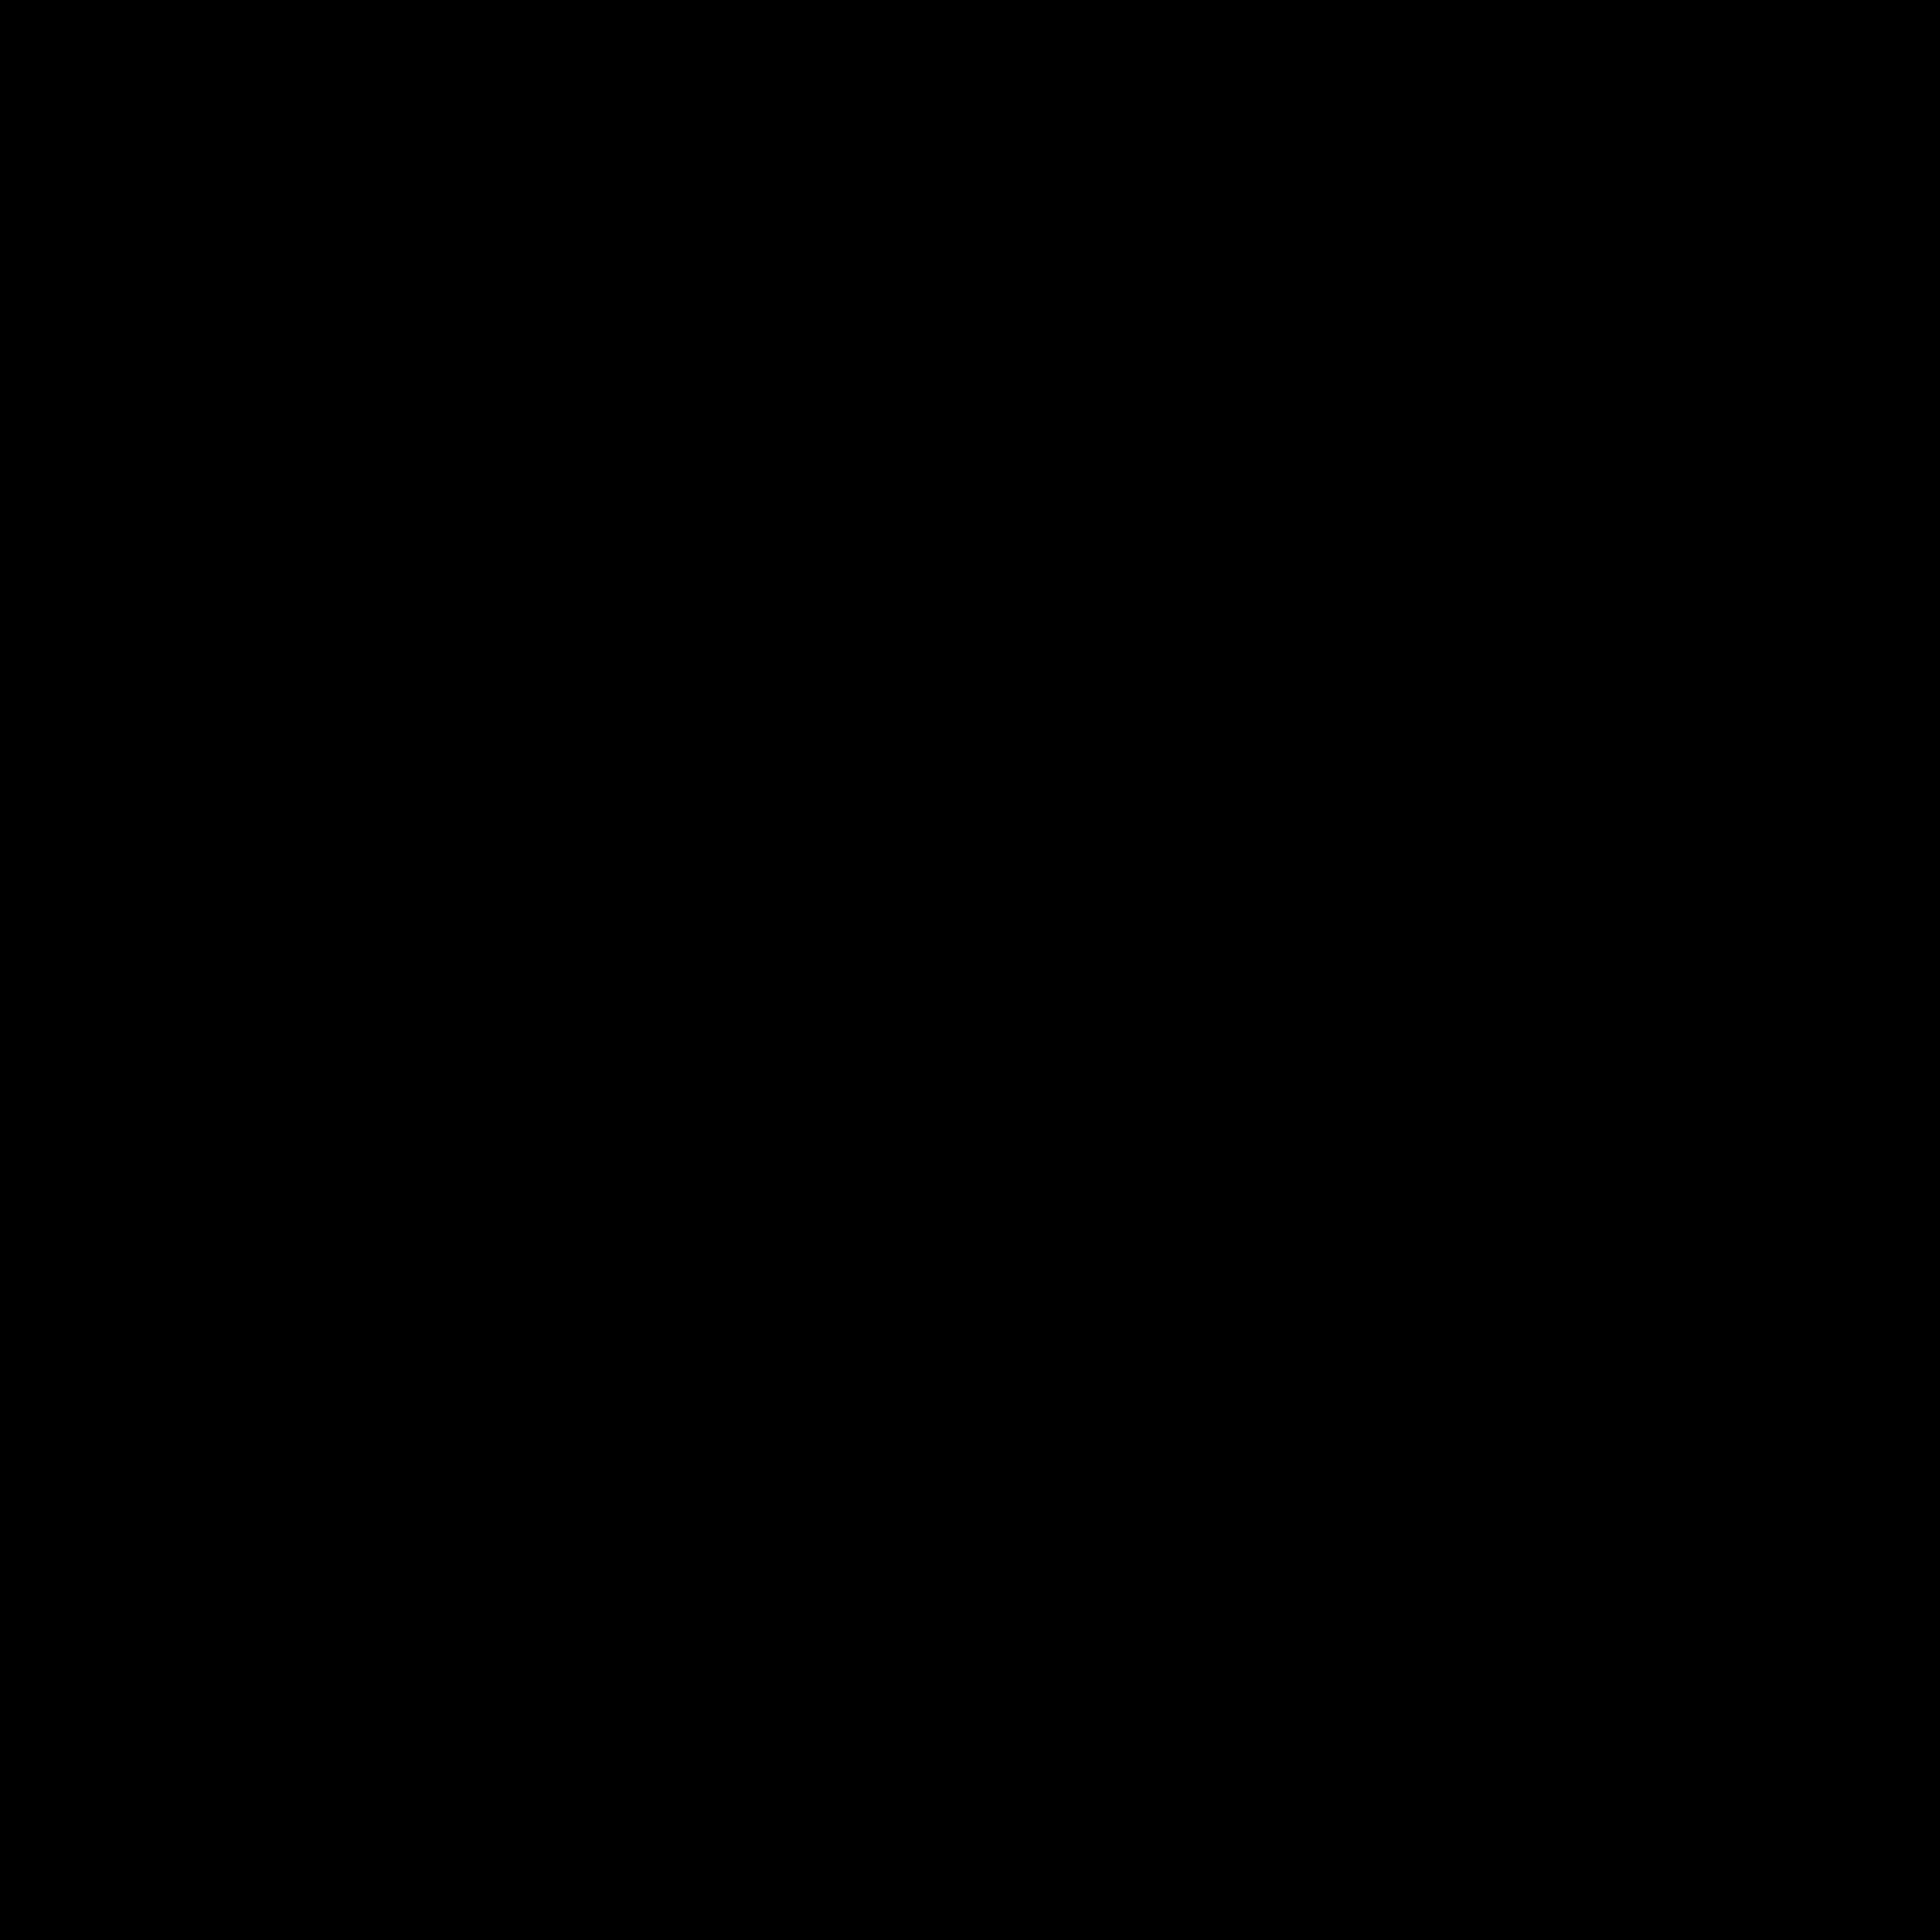 logo_03_black.png